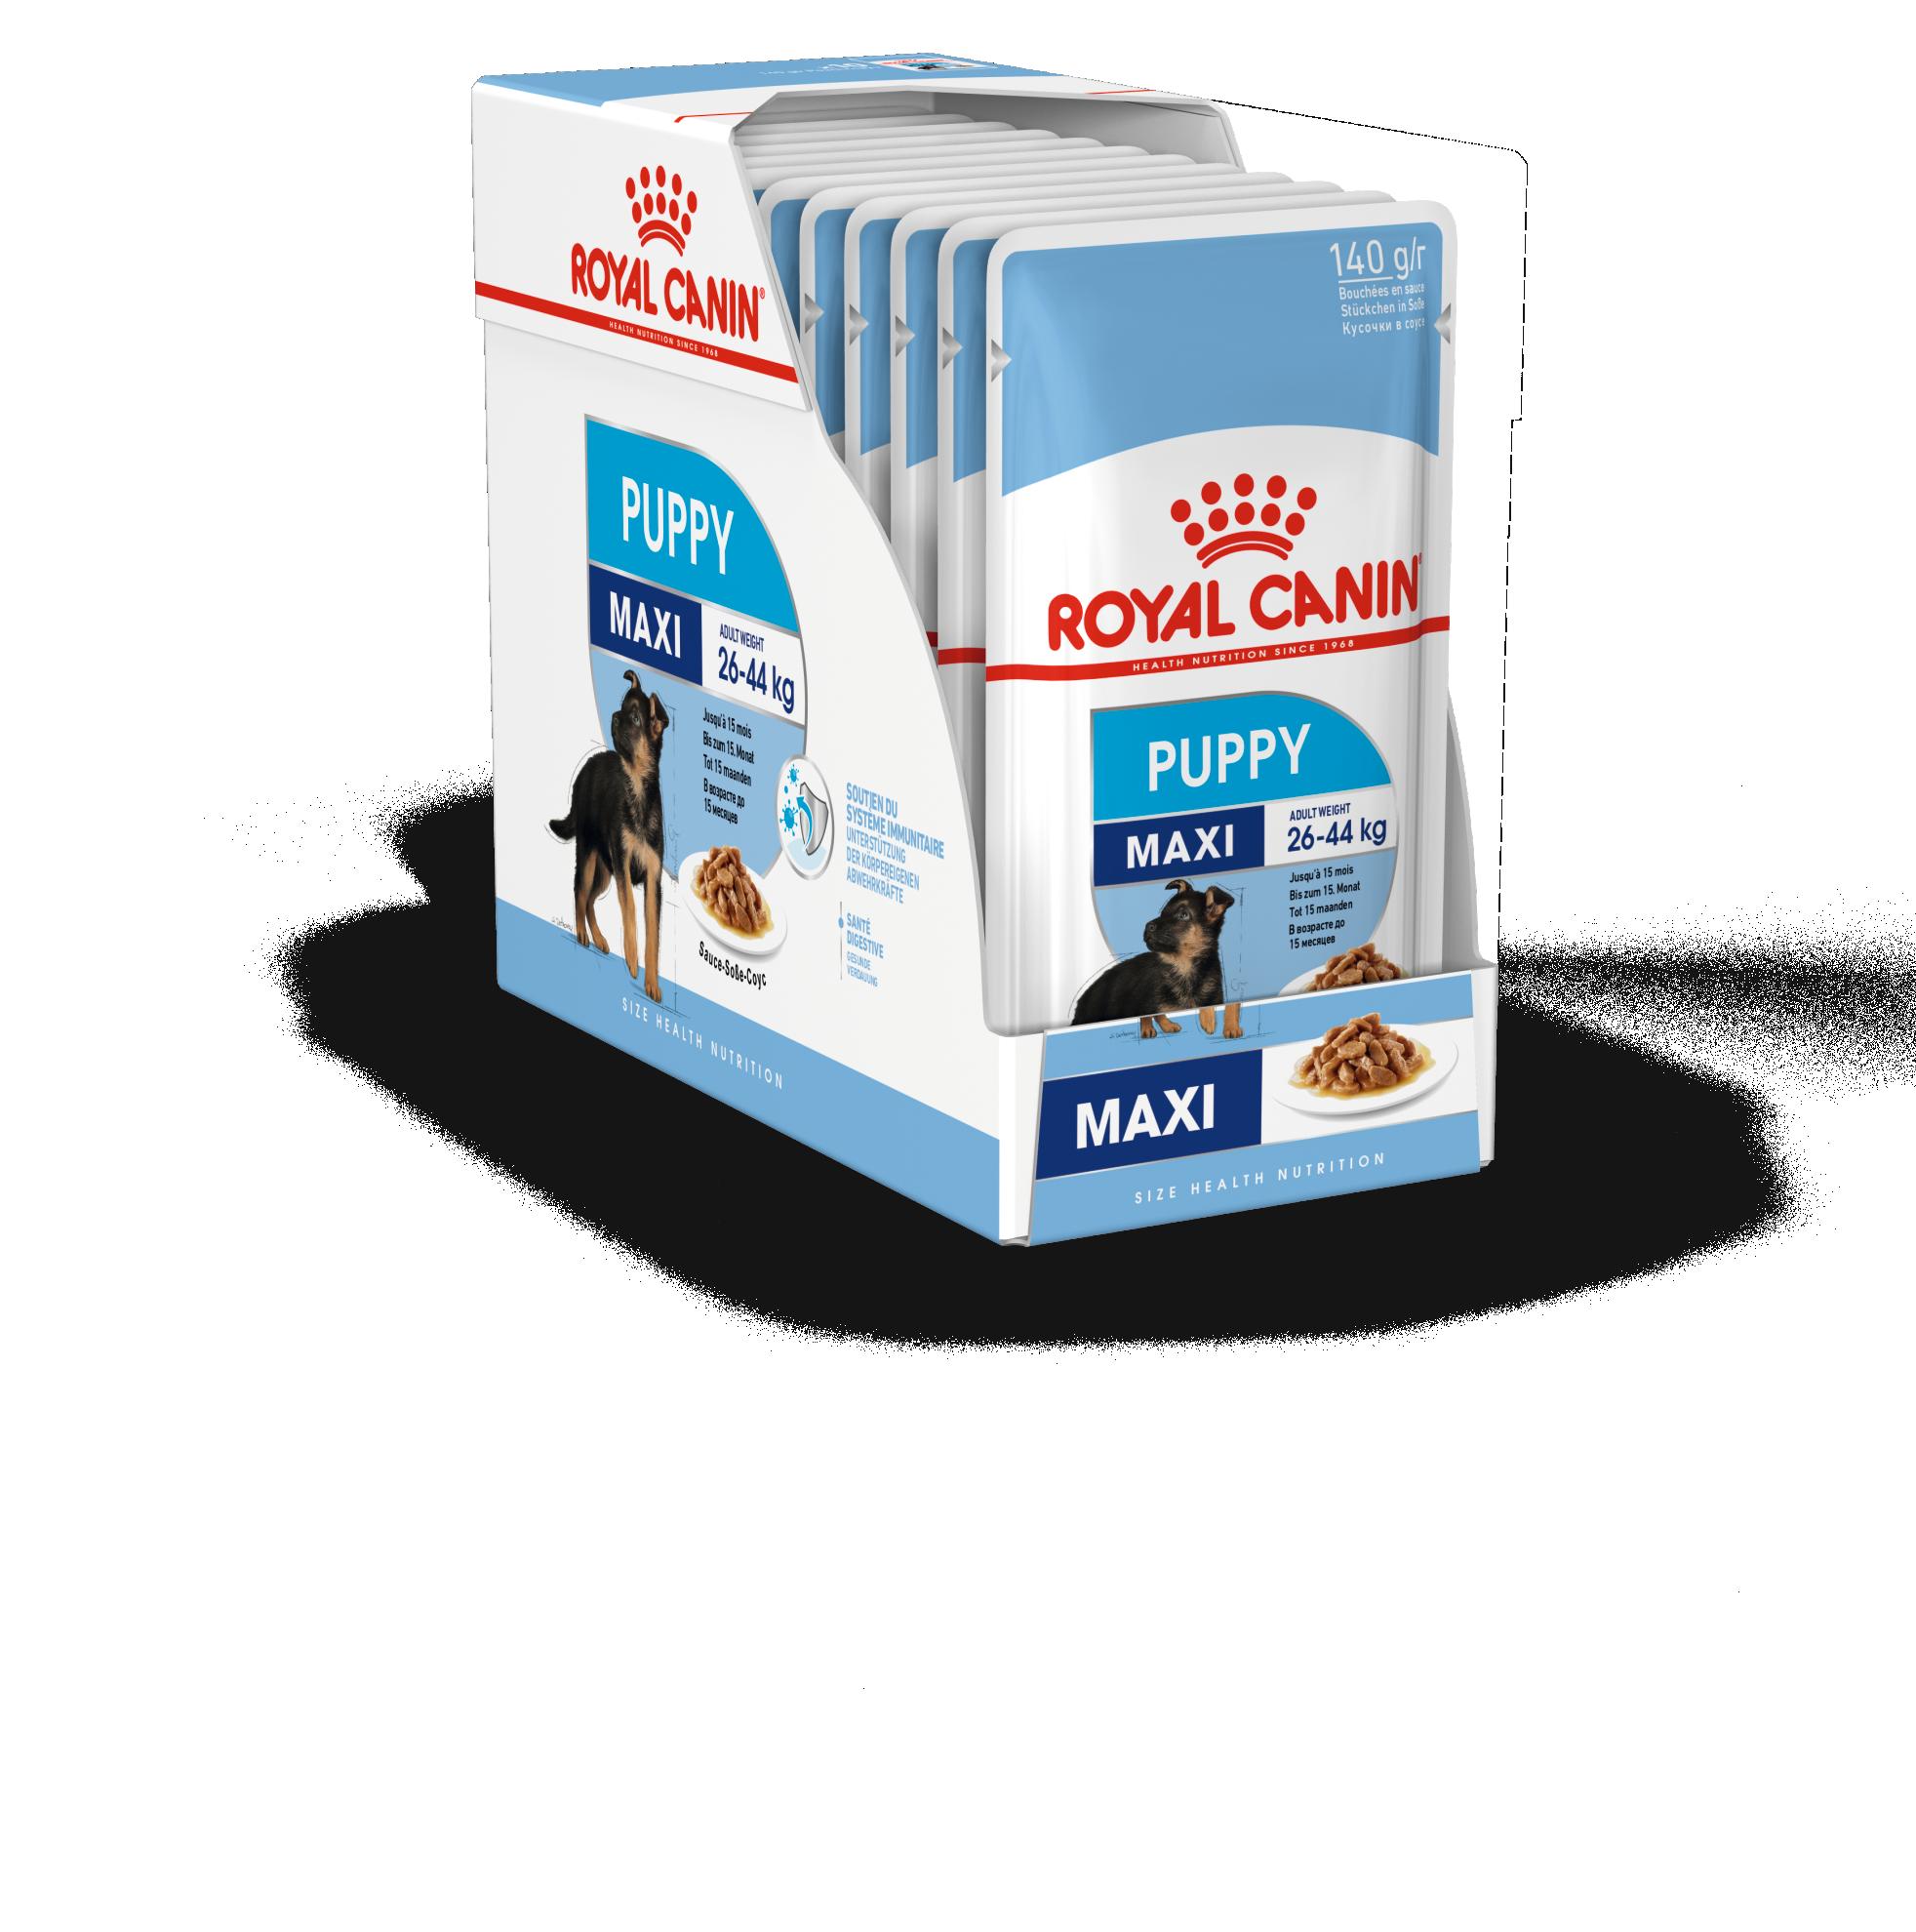 rc-maxi-puppy-box-10-x-140g